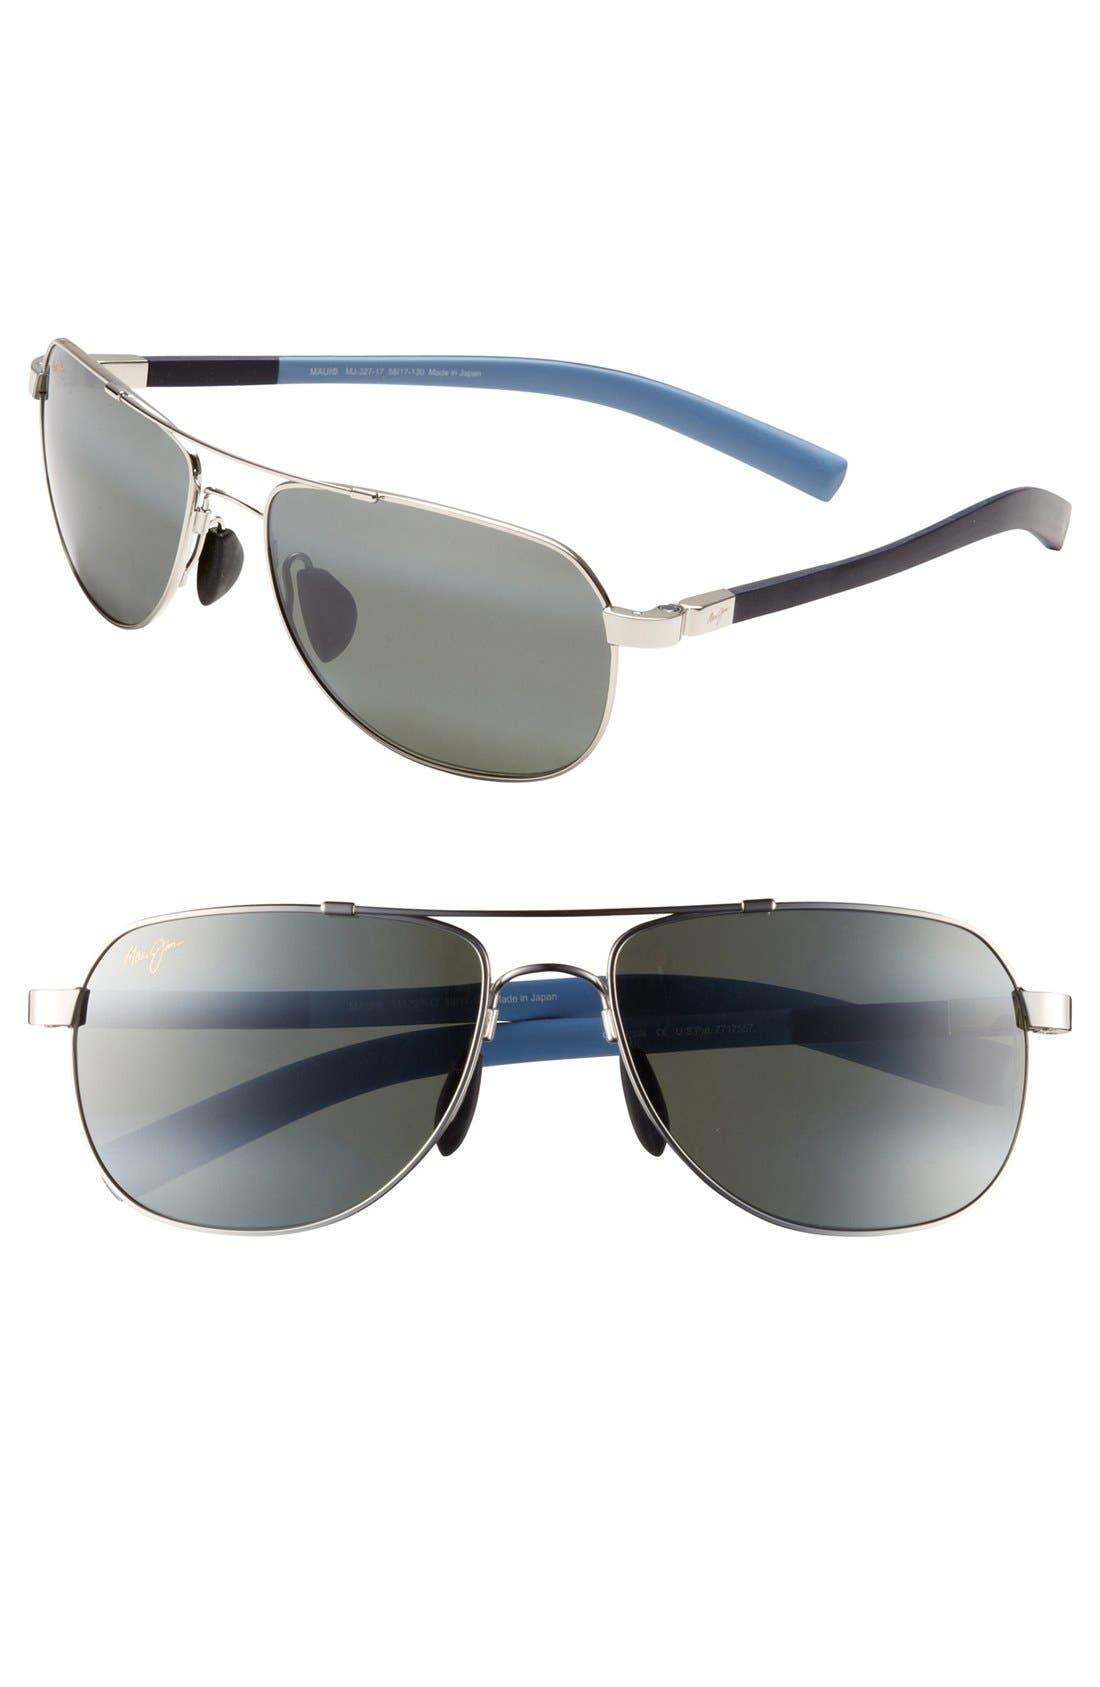 'Maui Flex - PolarizedPlus<sup>®</sup>2' 56mm Aviator Sunglasses,                             Main thumbnail 1, color,                             SILVER/ BLUE/ LIGHT BLUE